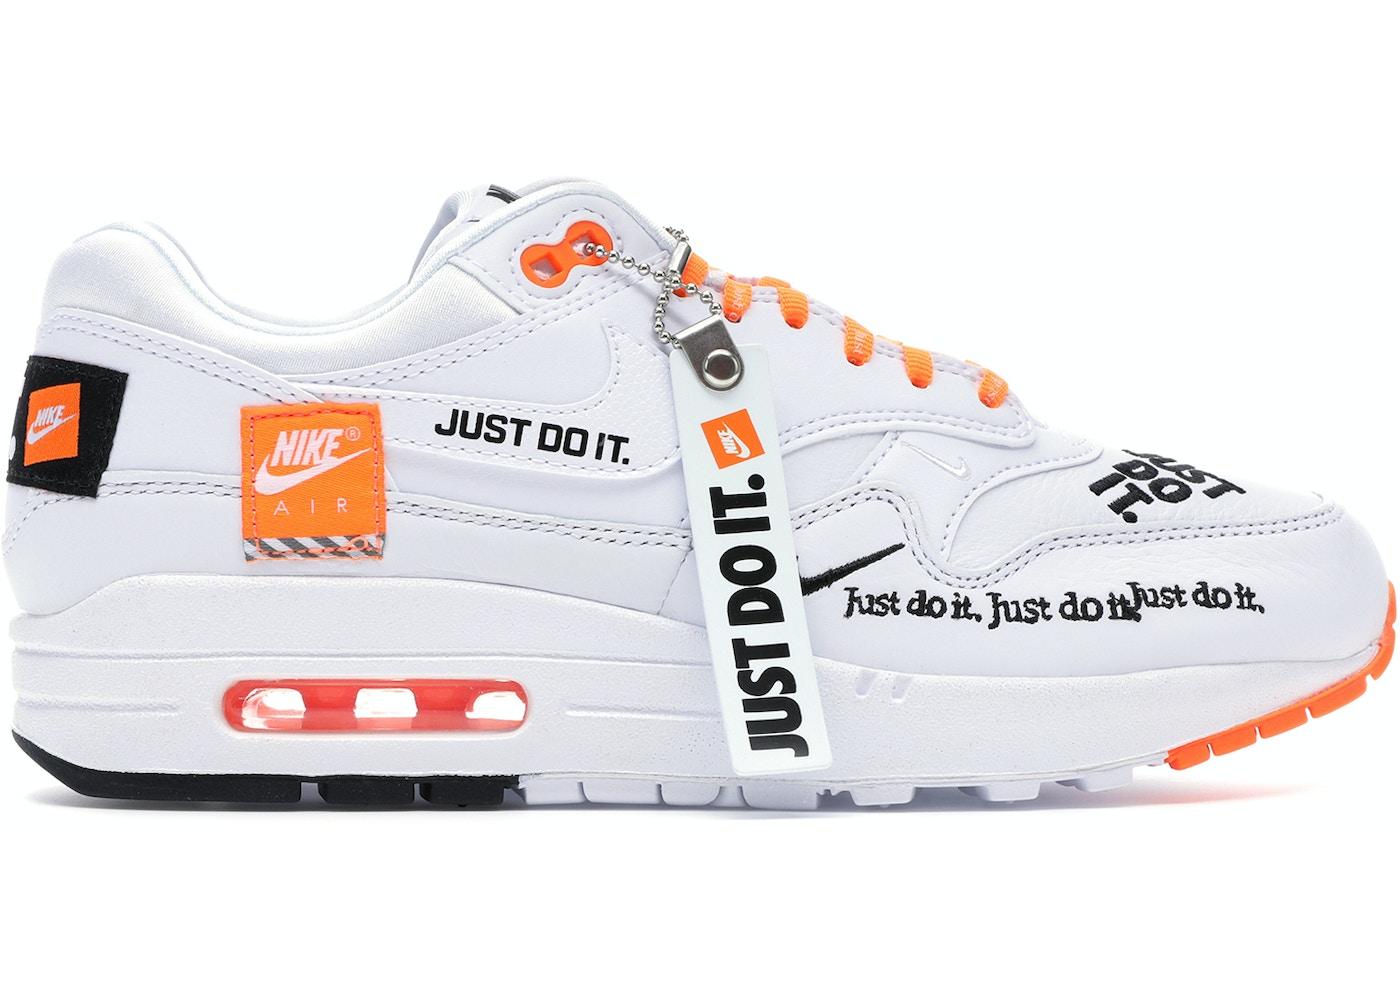 2bc4f10754 Nike Air Max 1 Shoes - New Highest Bids